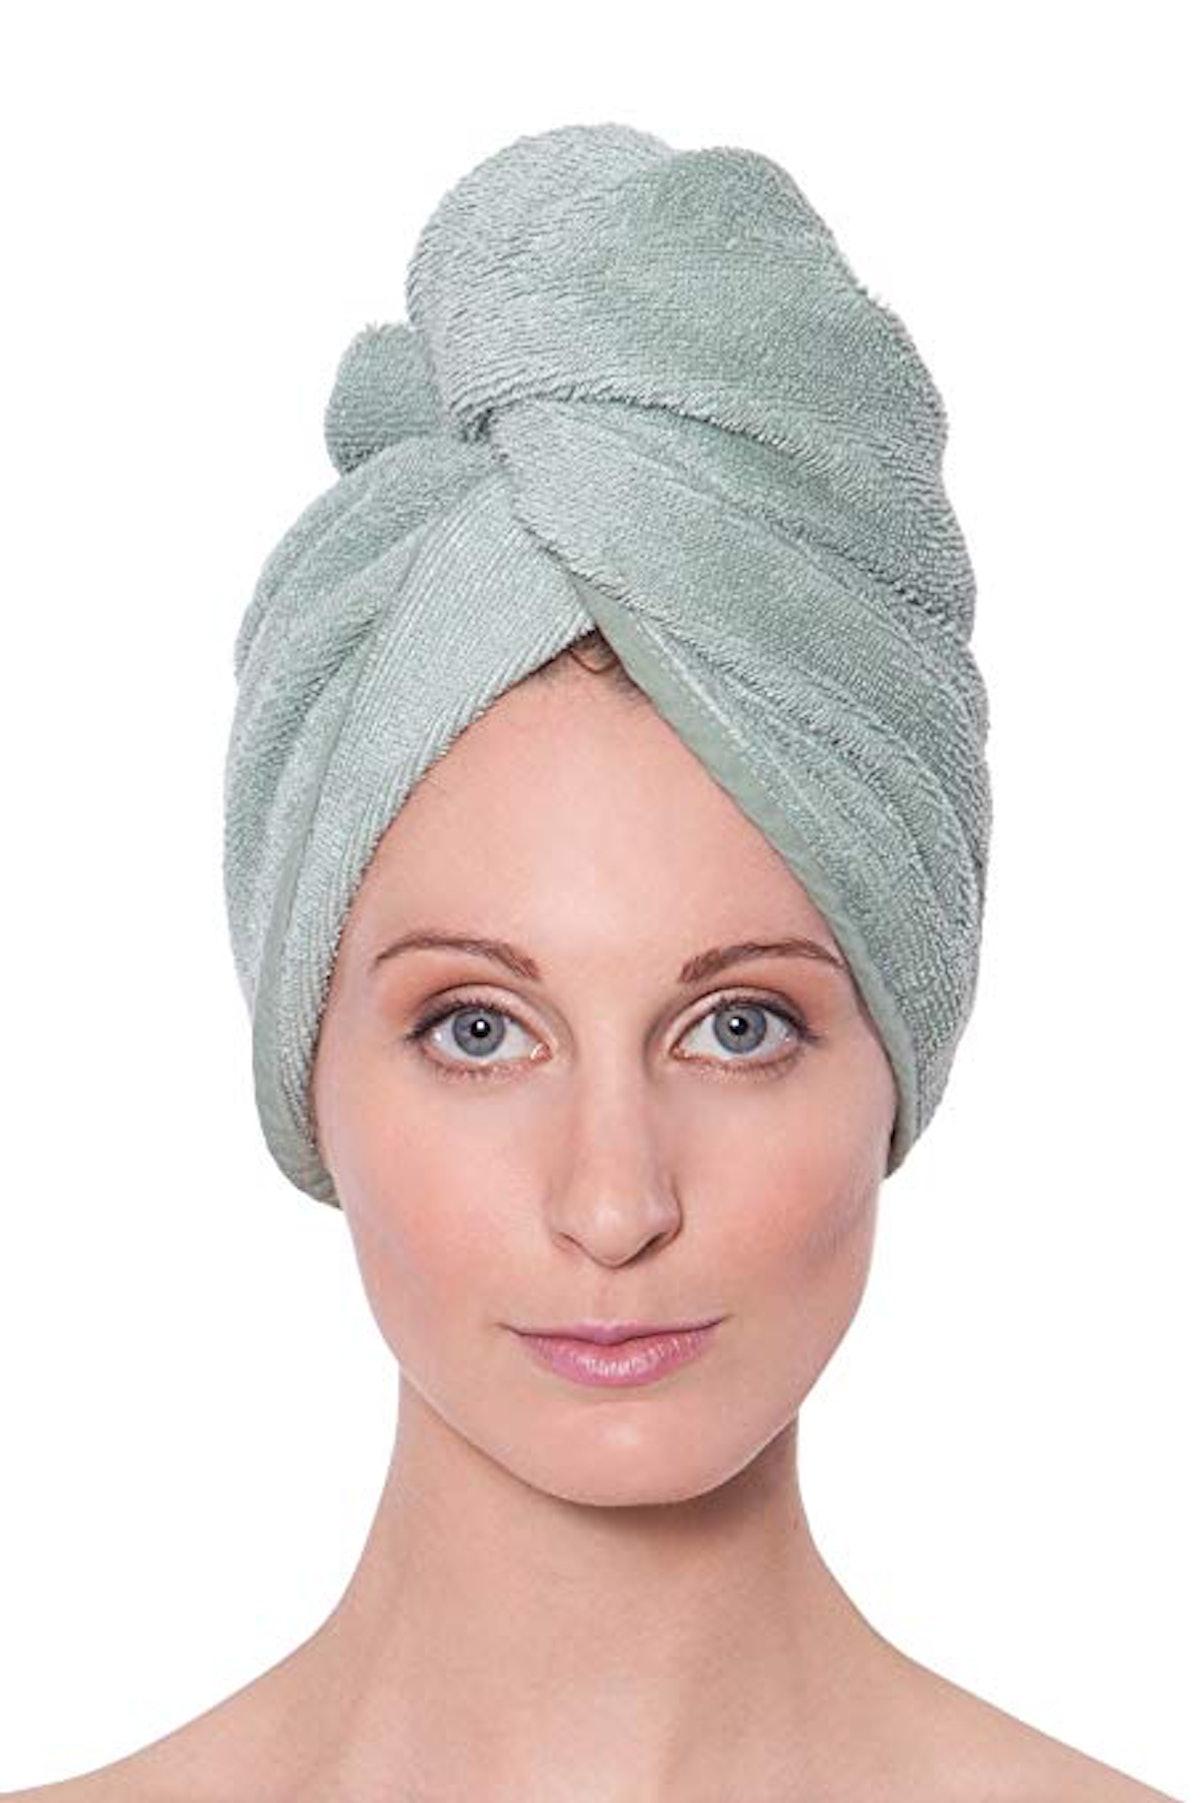 TexereSilk Bamboo Hair Towel